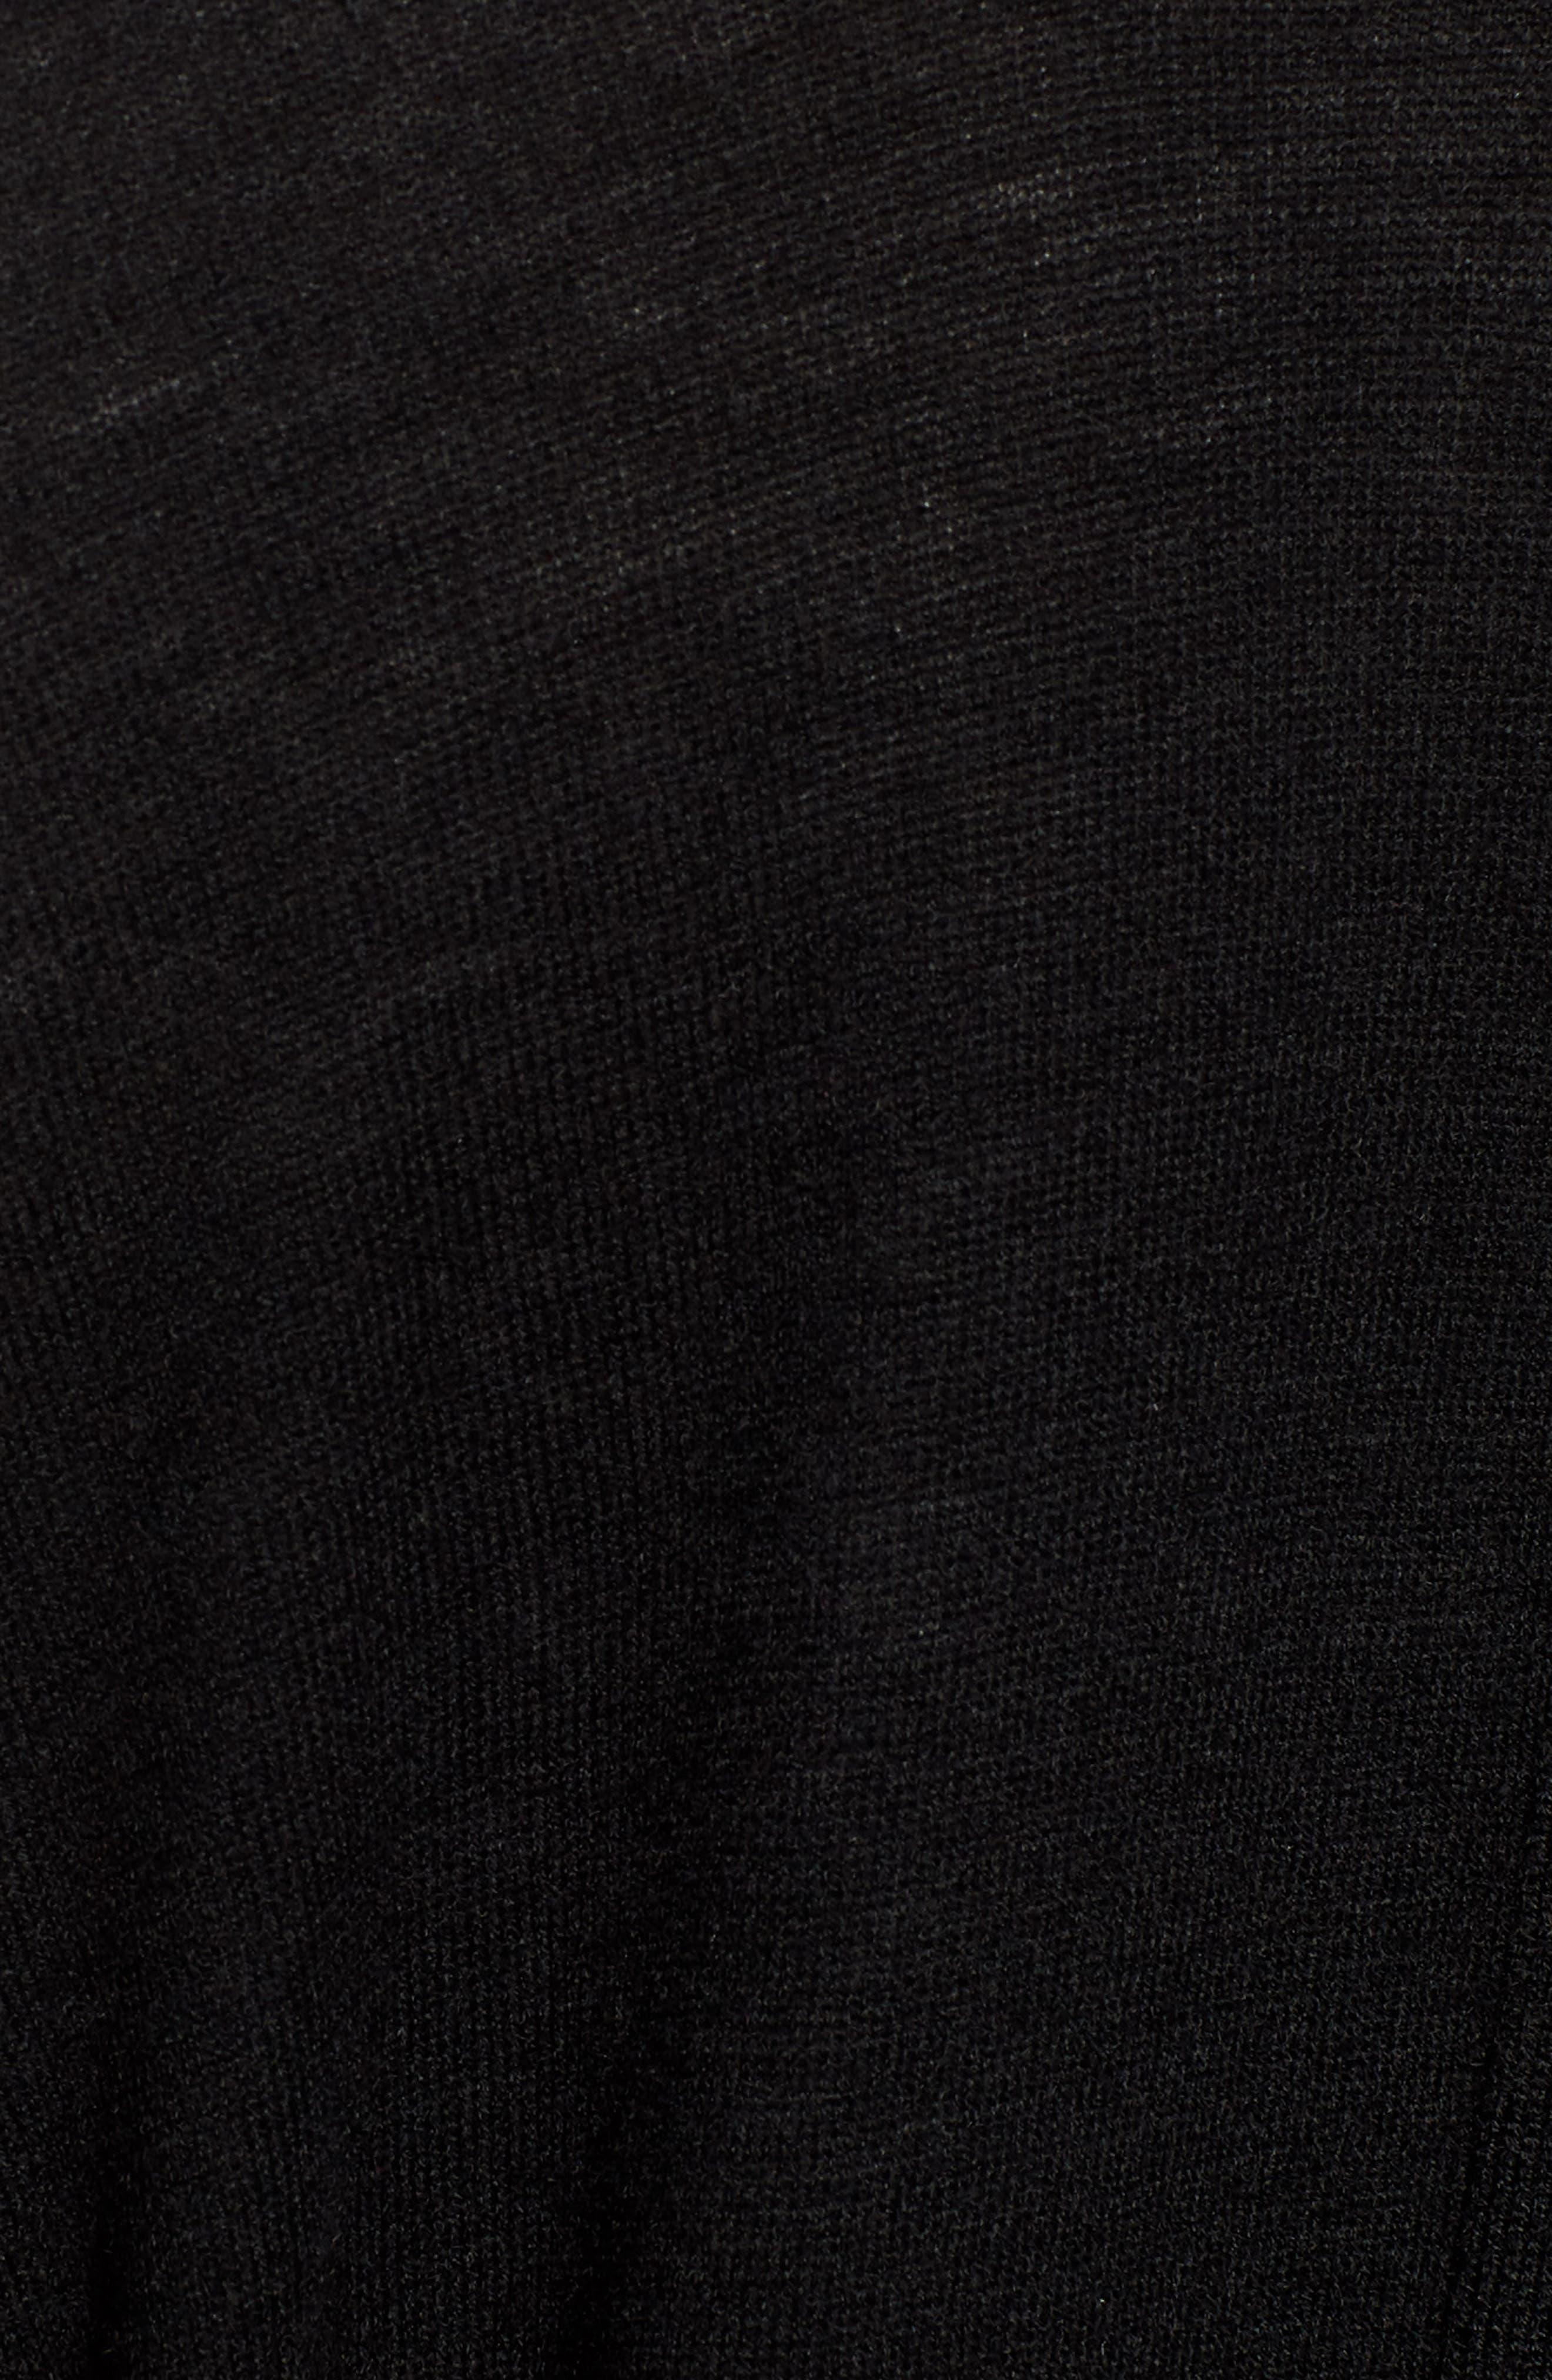 Tie Back Cardigan,                             Alternate thumbnail 5, color,                             Black